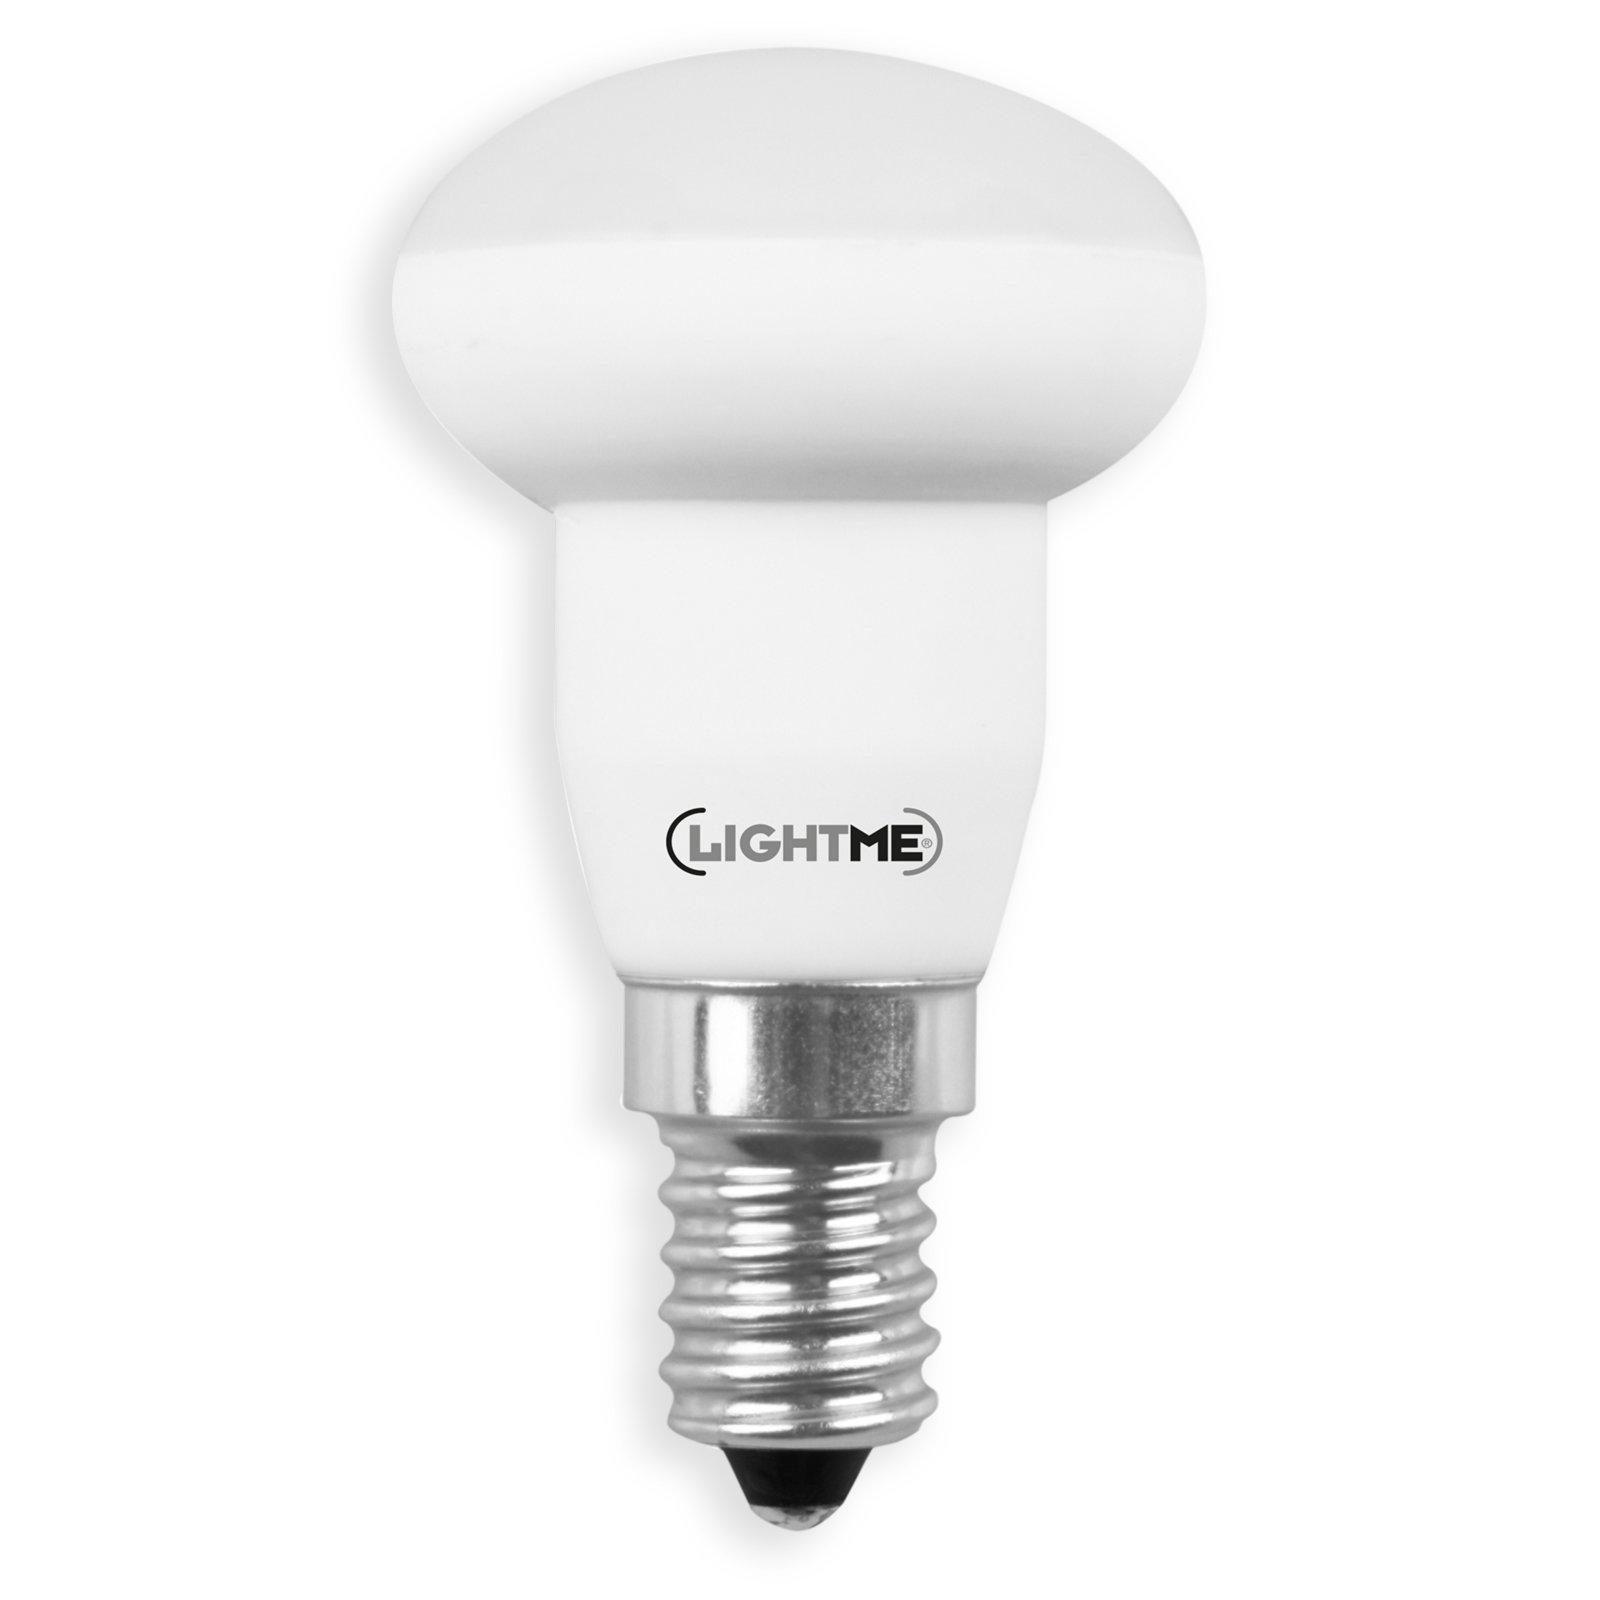 led reflektor lightme e14 3 5 w warmwei led leuchtmittel leuchtmittel gl hbirnen. Black Bedroom Furniture Sets. Home Design Ideas